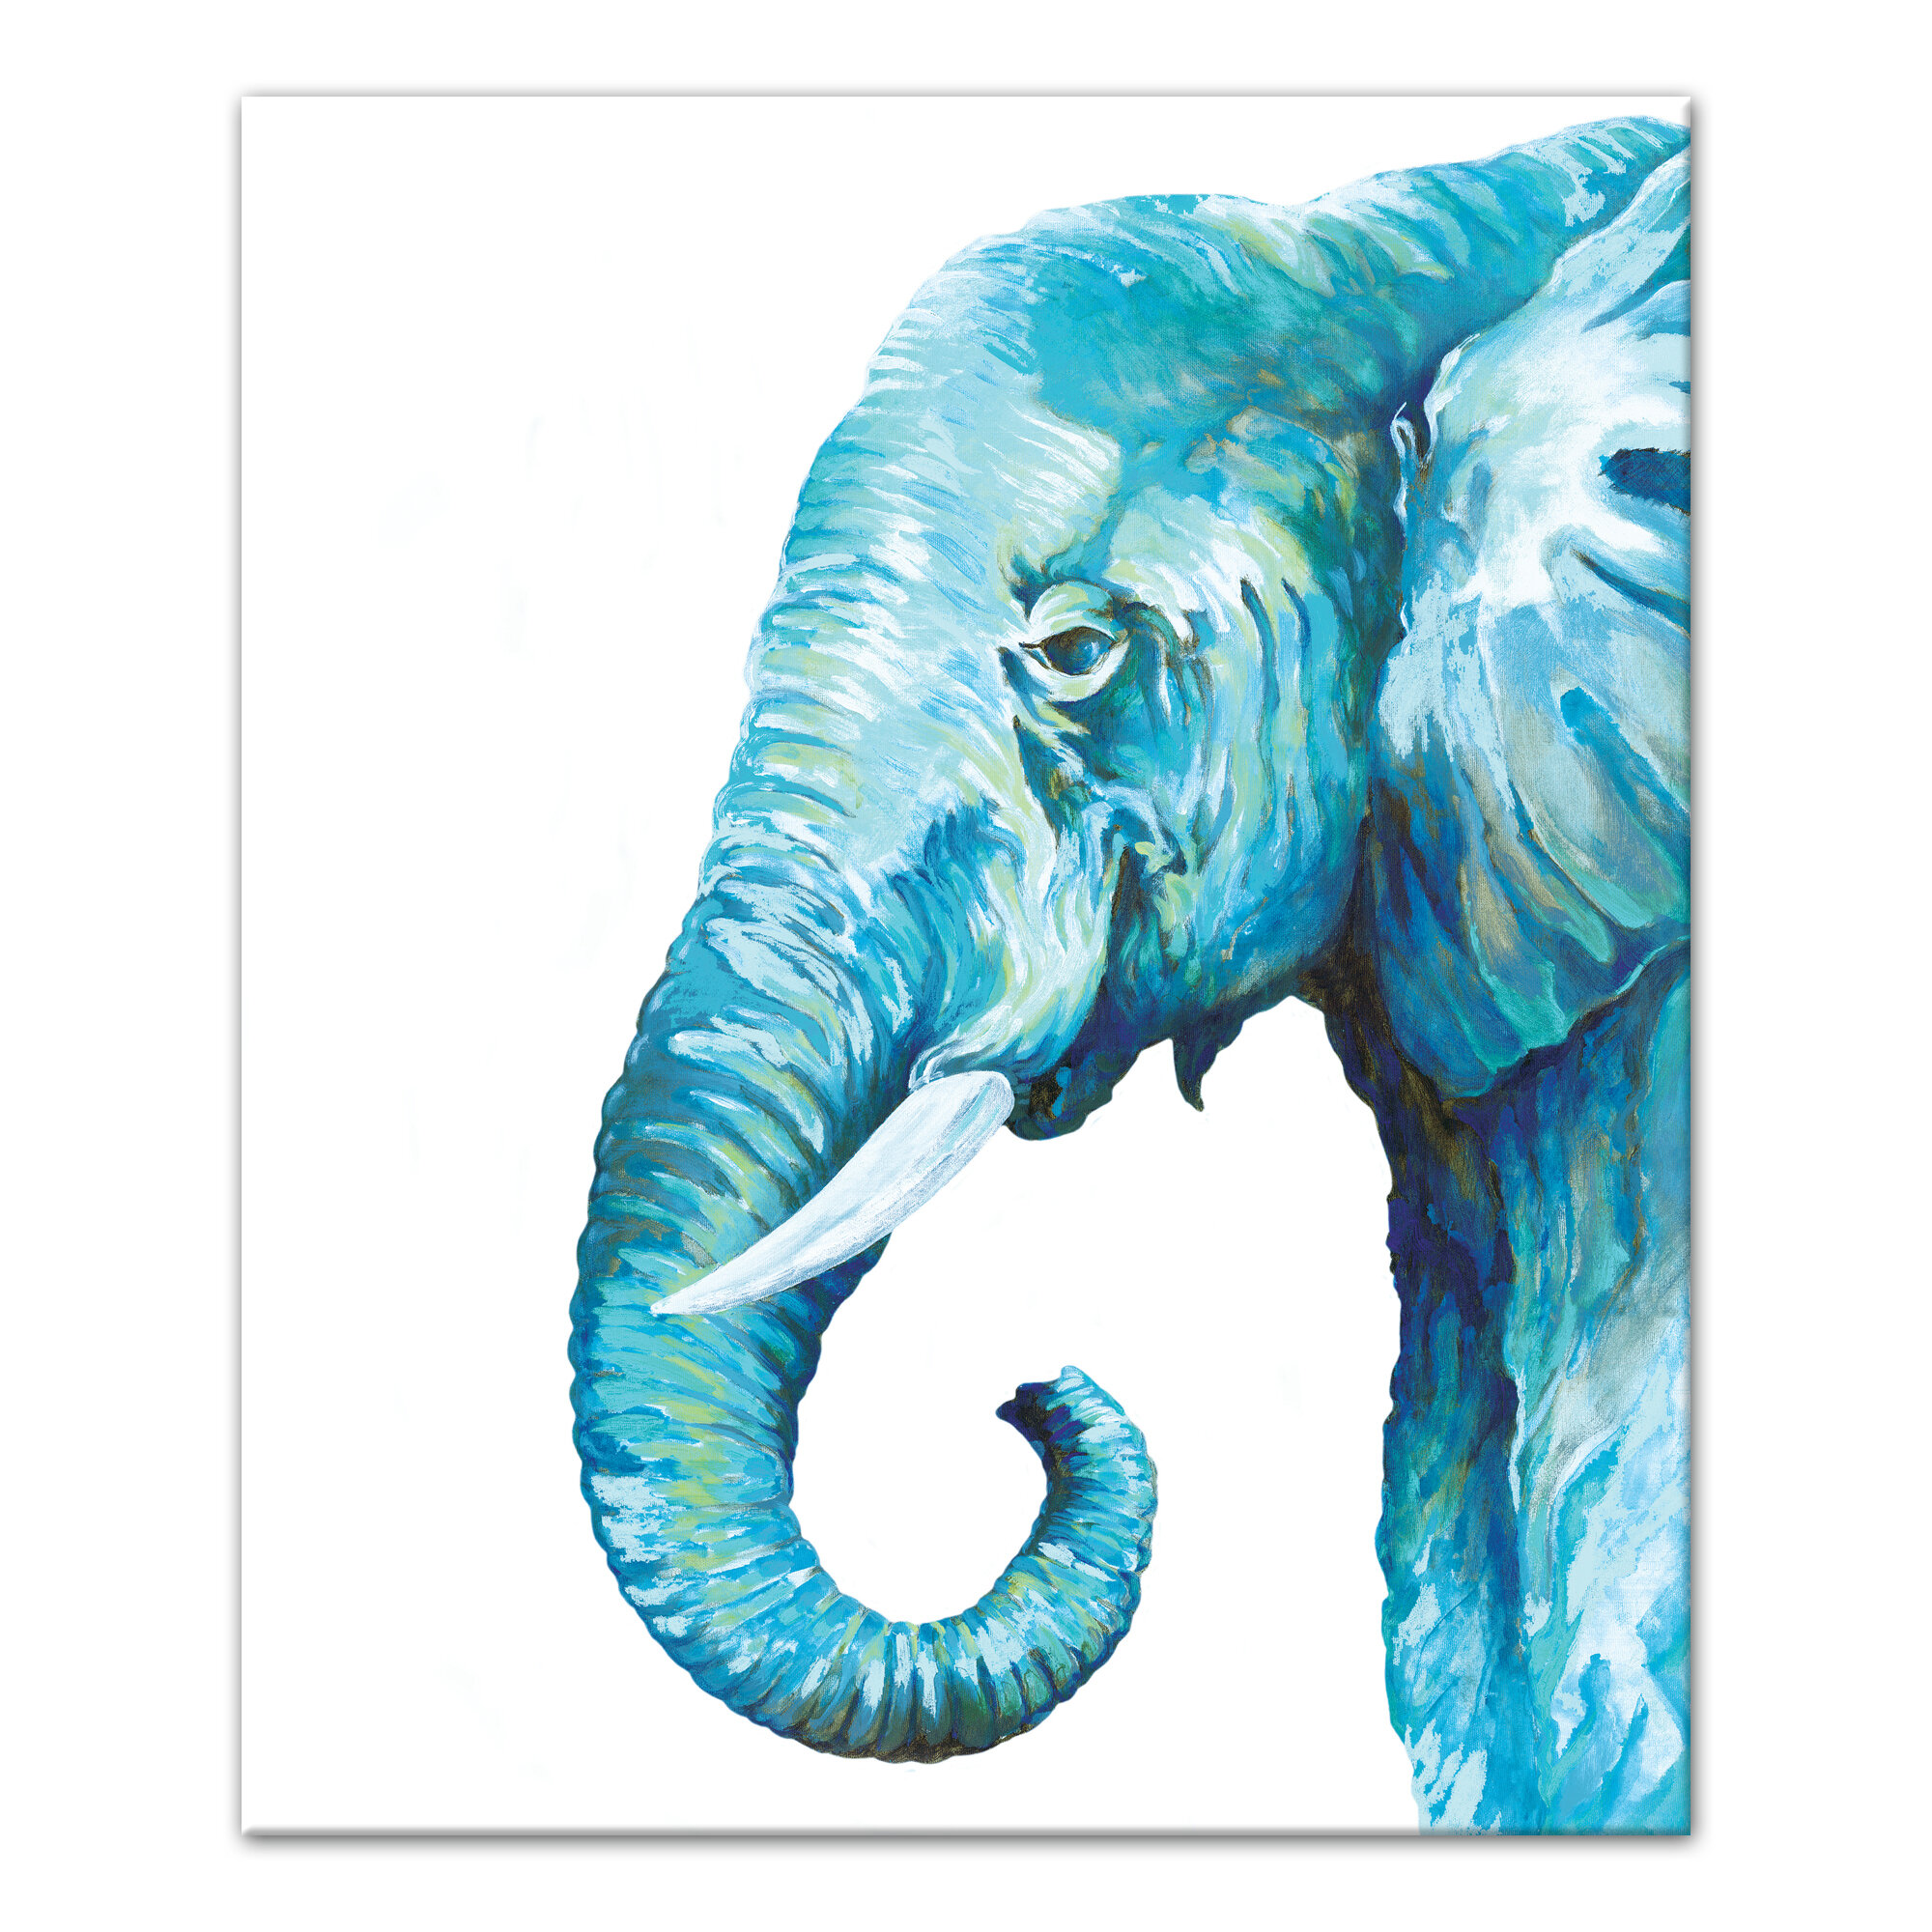 Blue Elephant\' Watercolor Painting Print on Canvas | Joss & Main